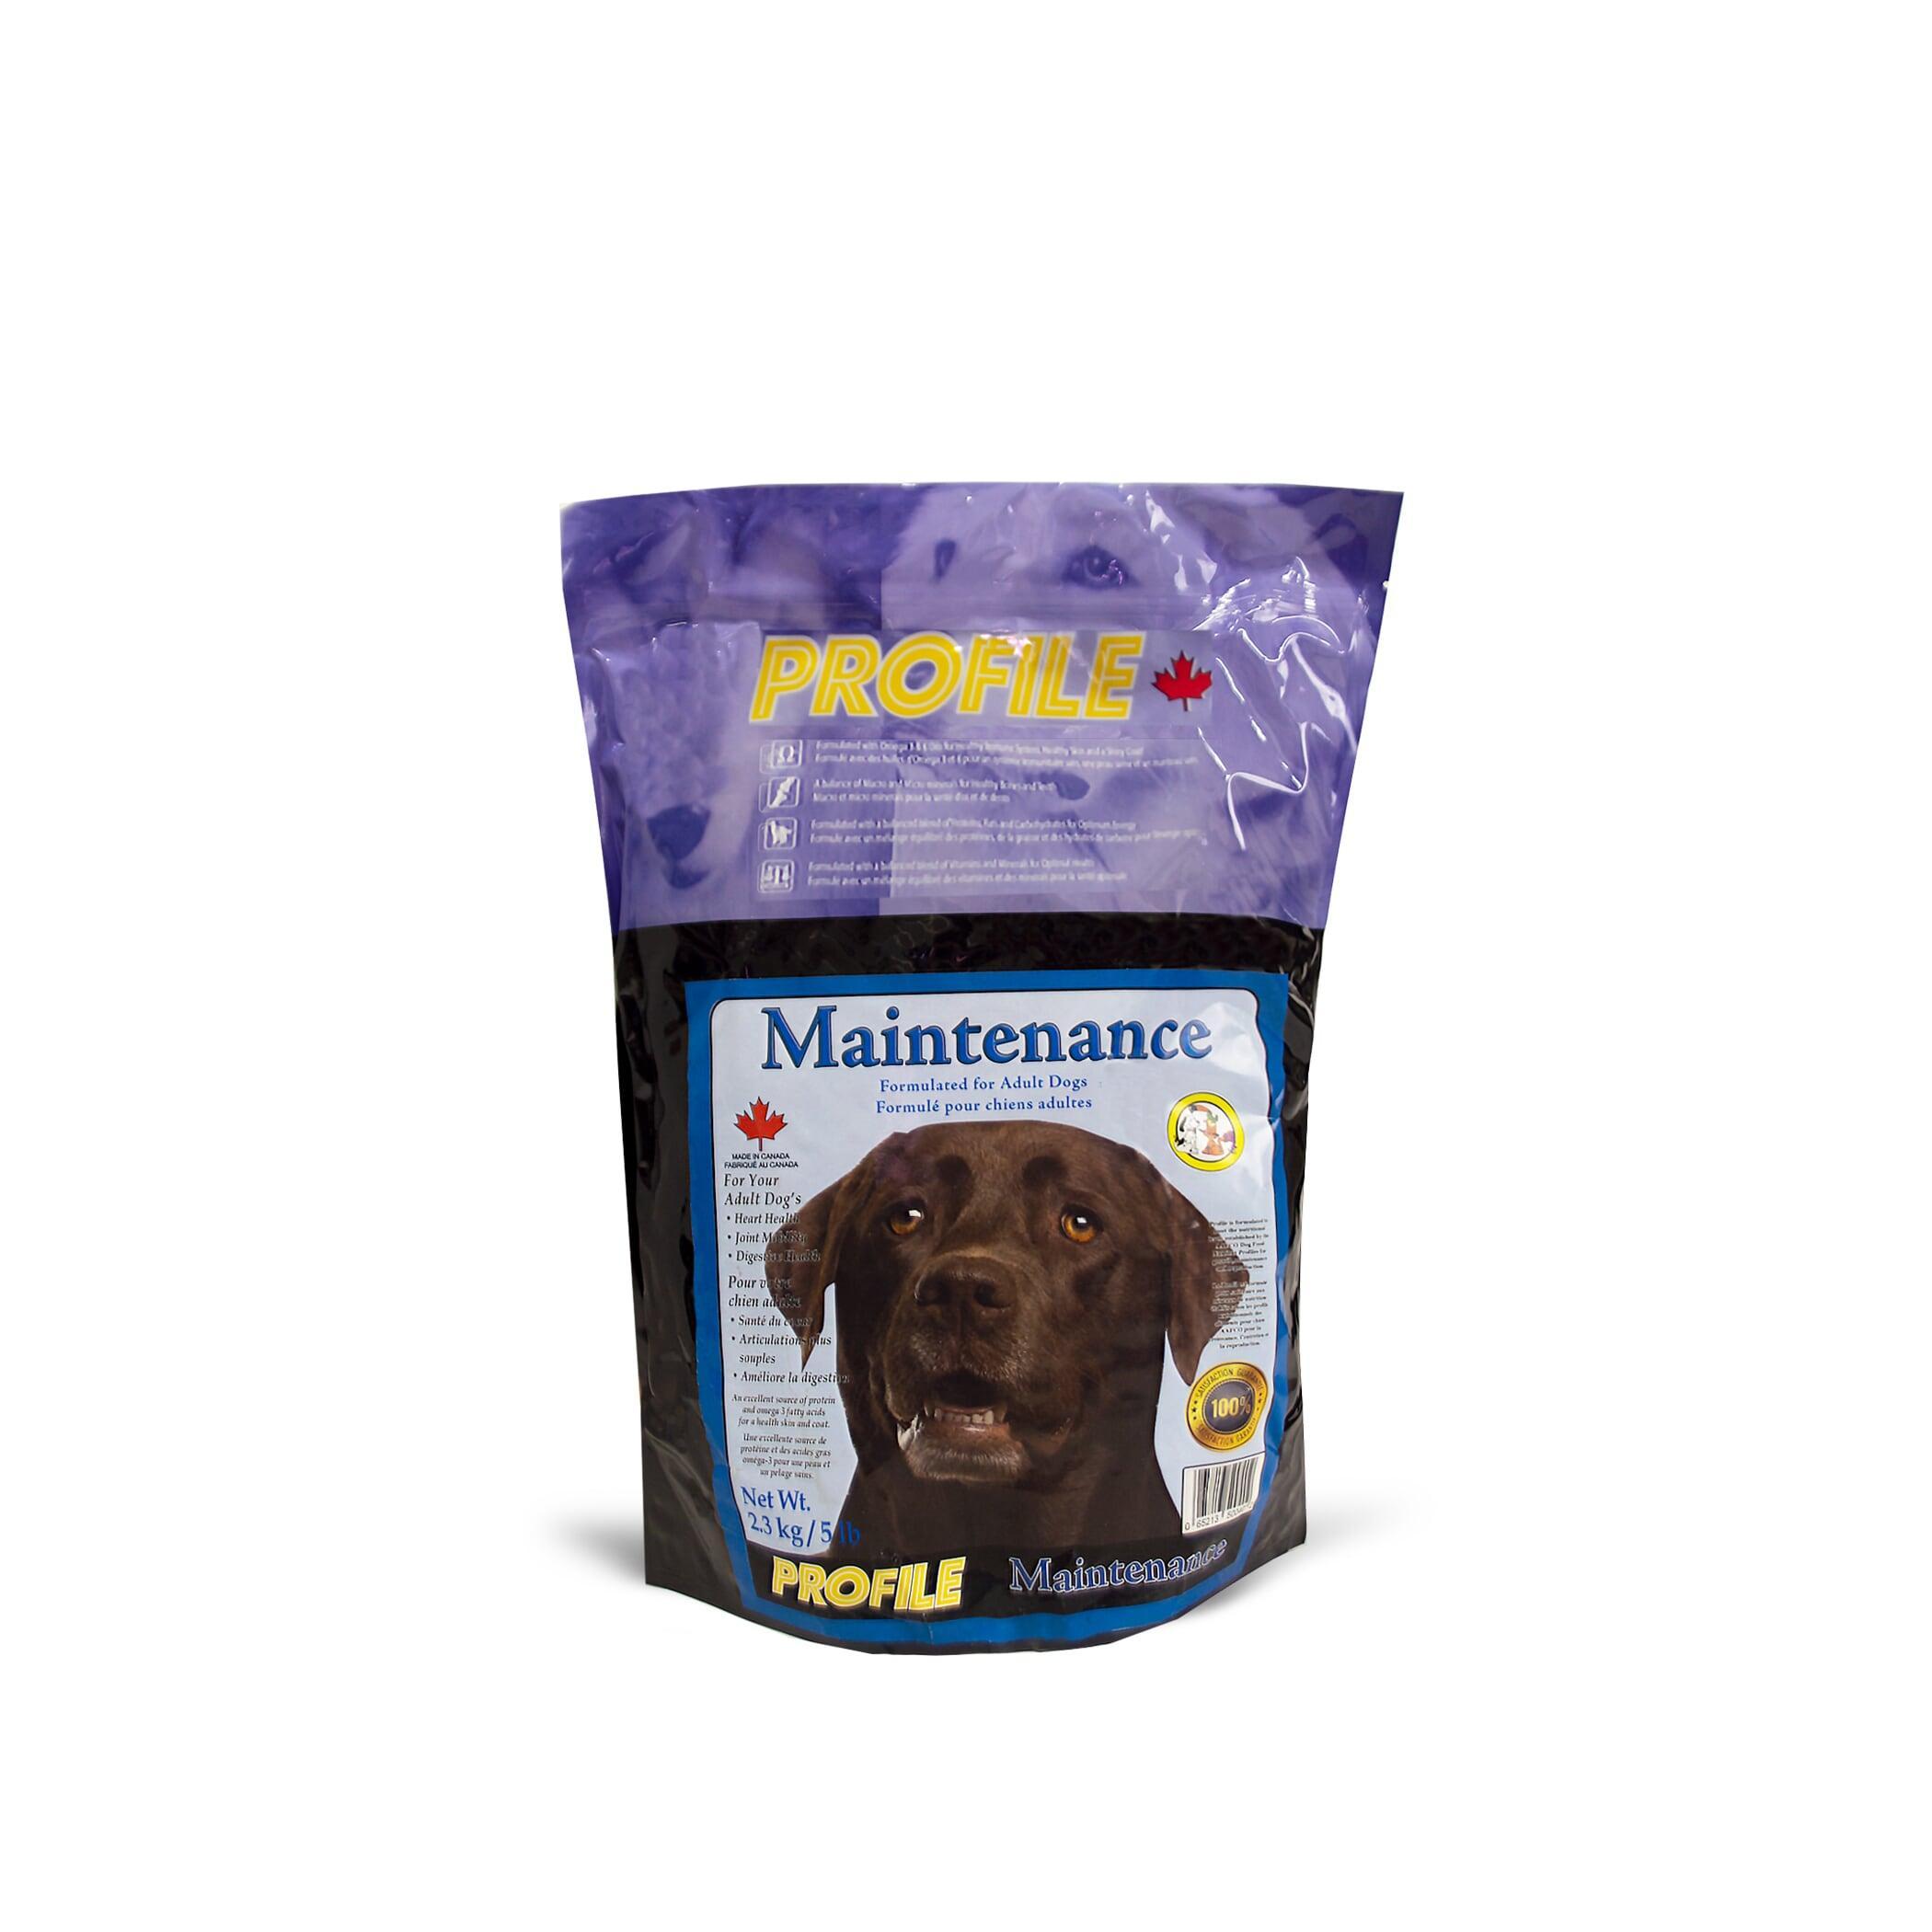 Profile Maintenance Dry Dog Food, 2.3-kg